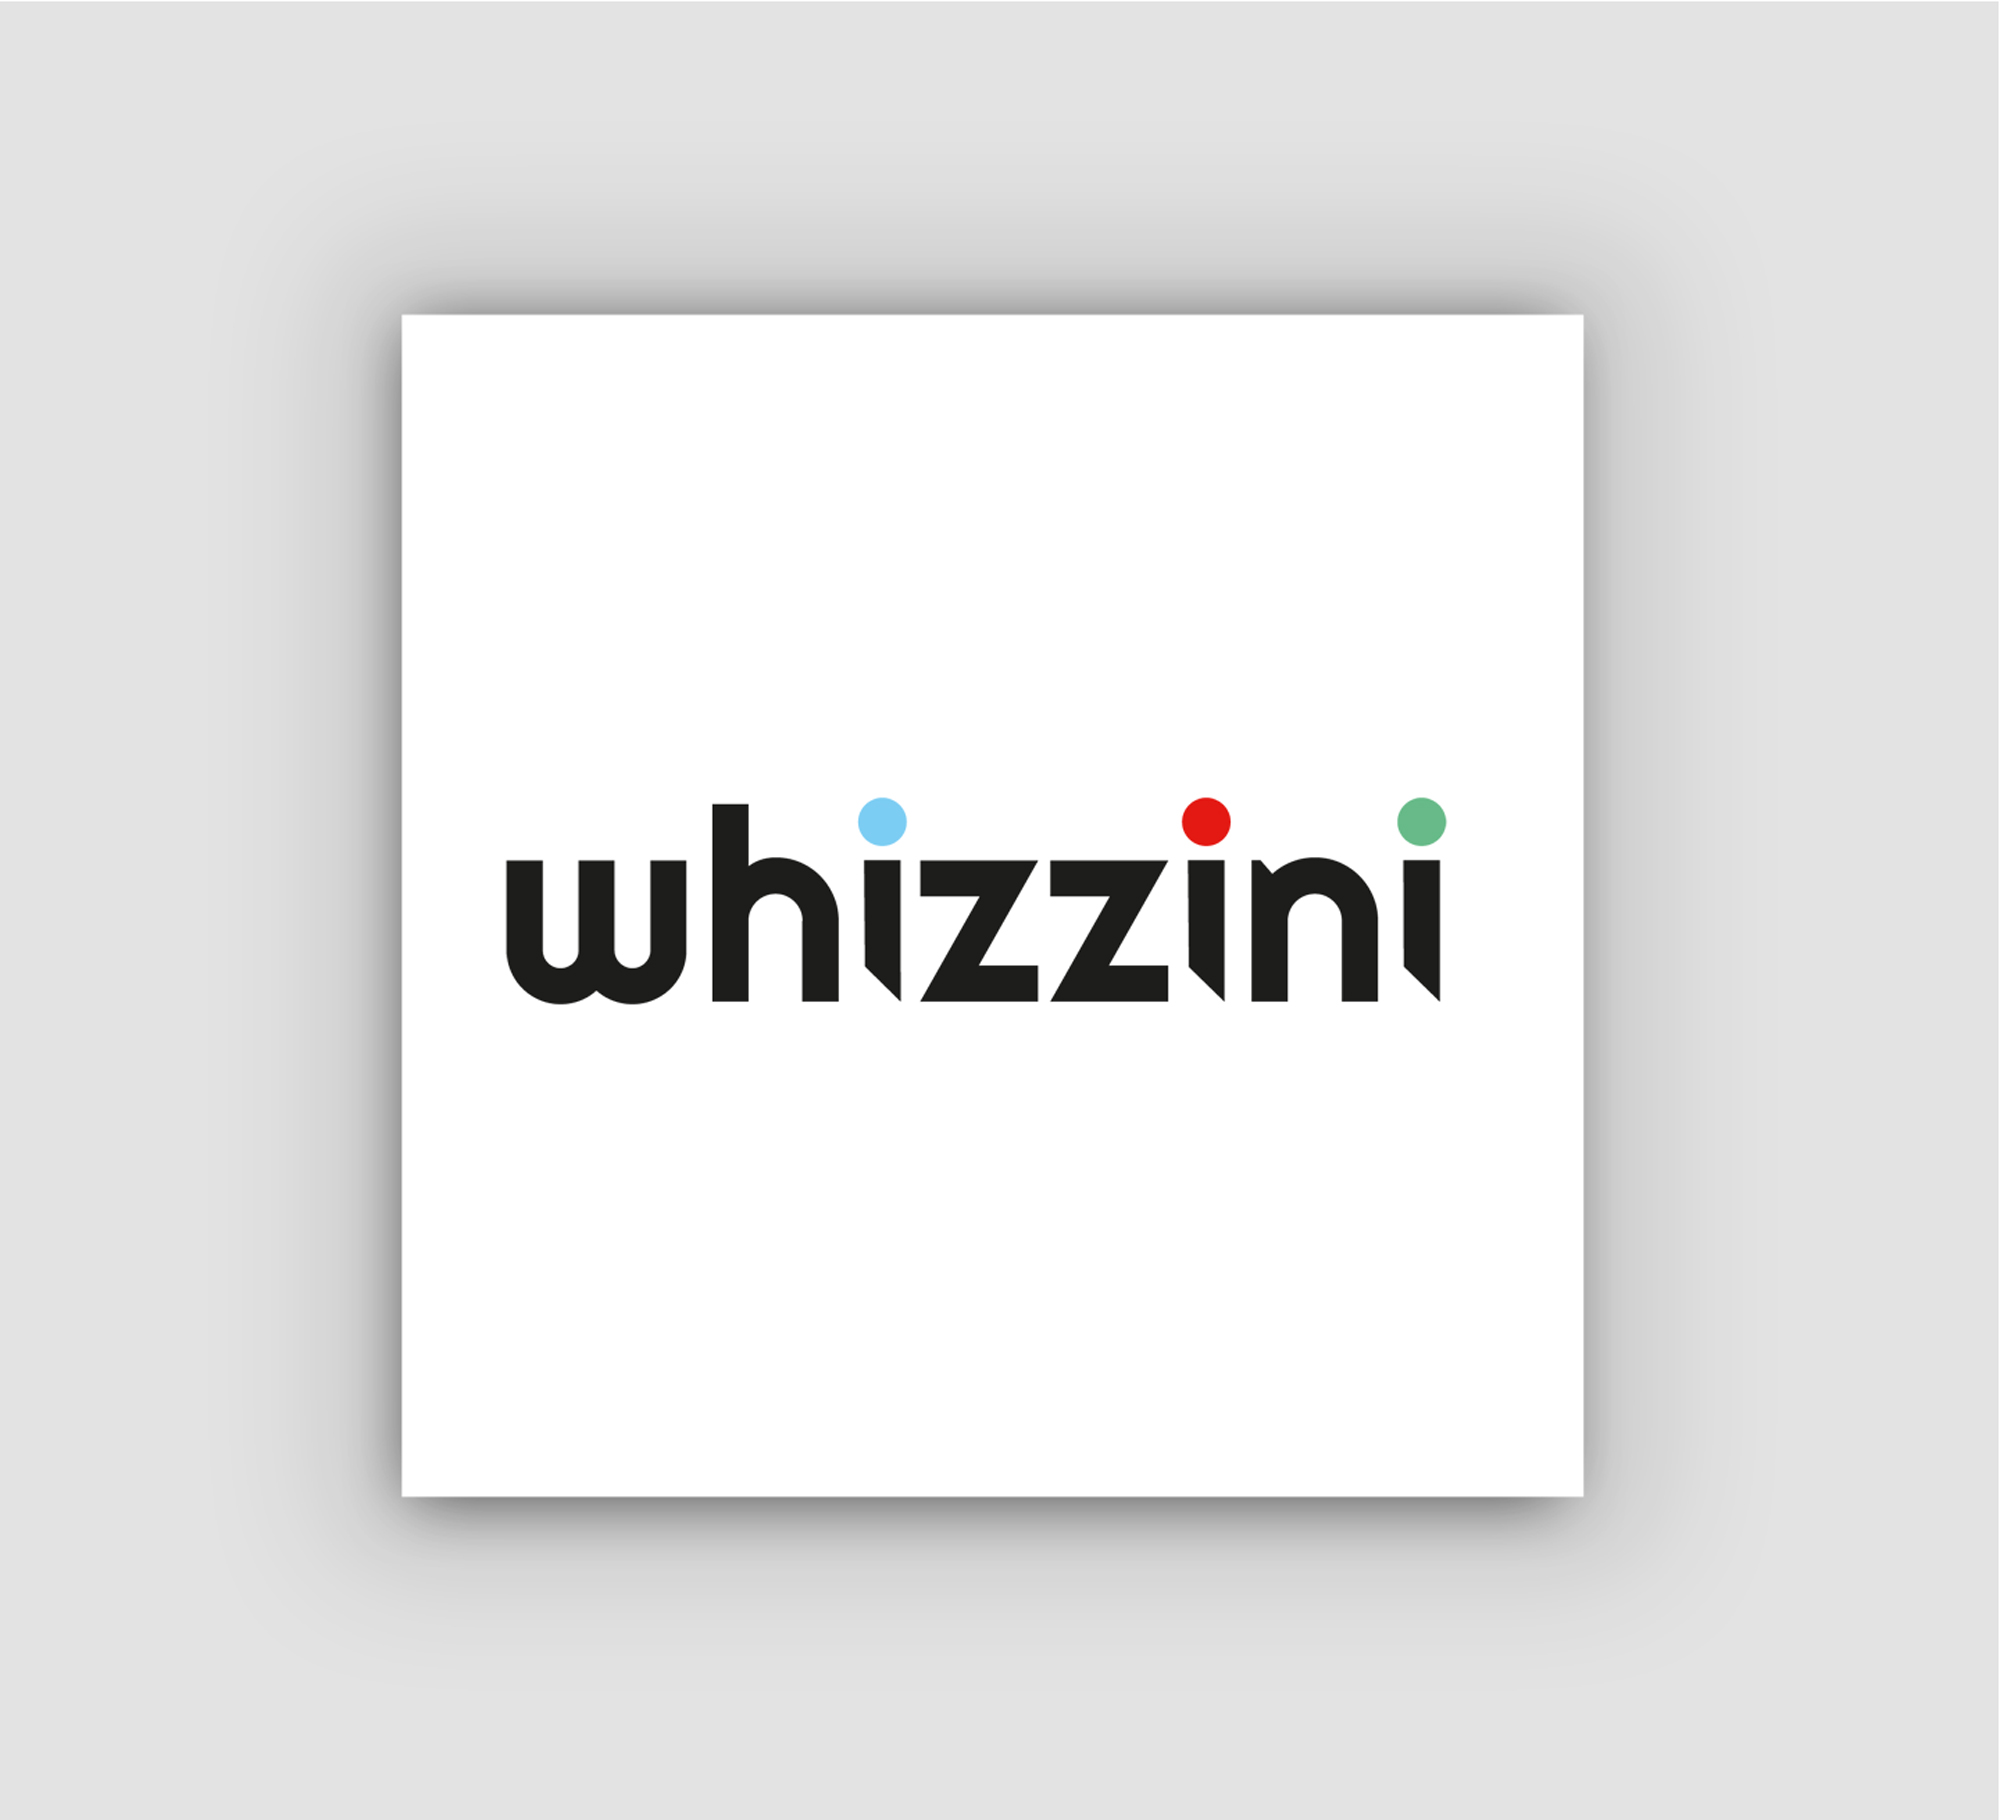 whizzini_grey_2_logo